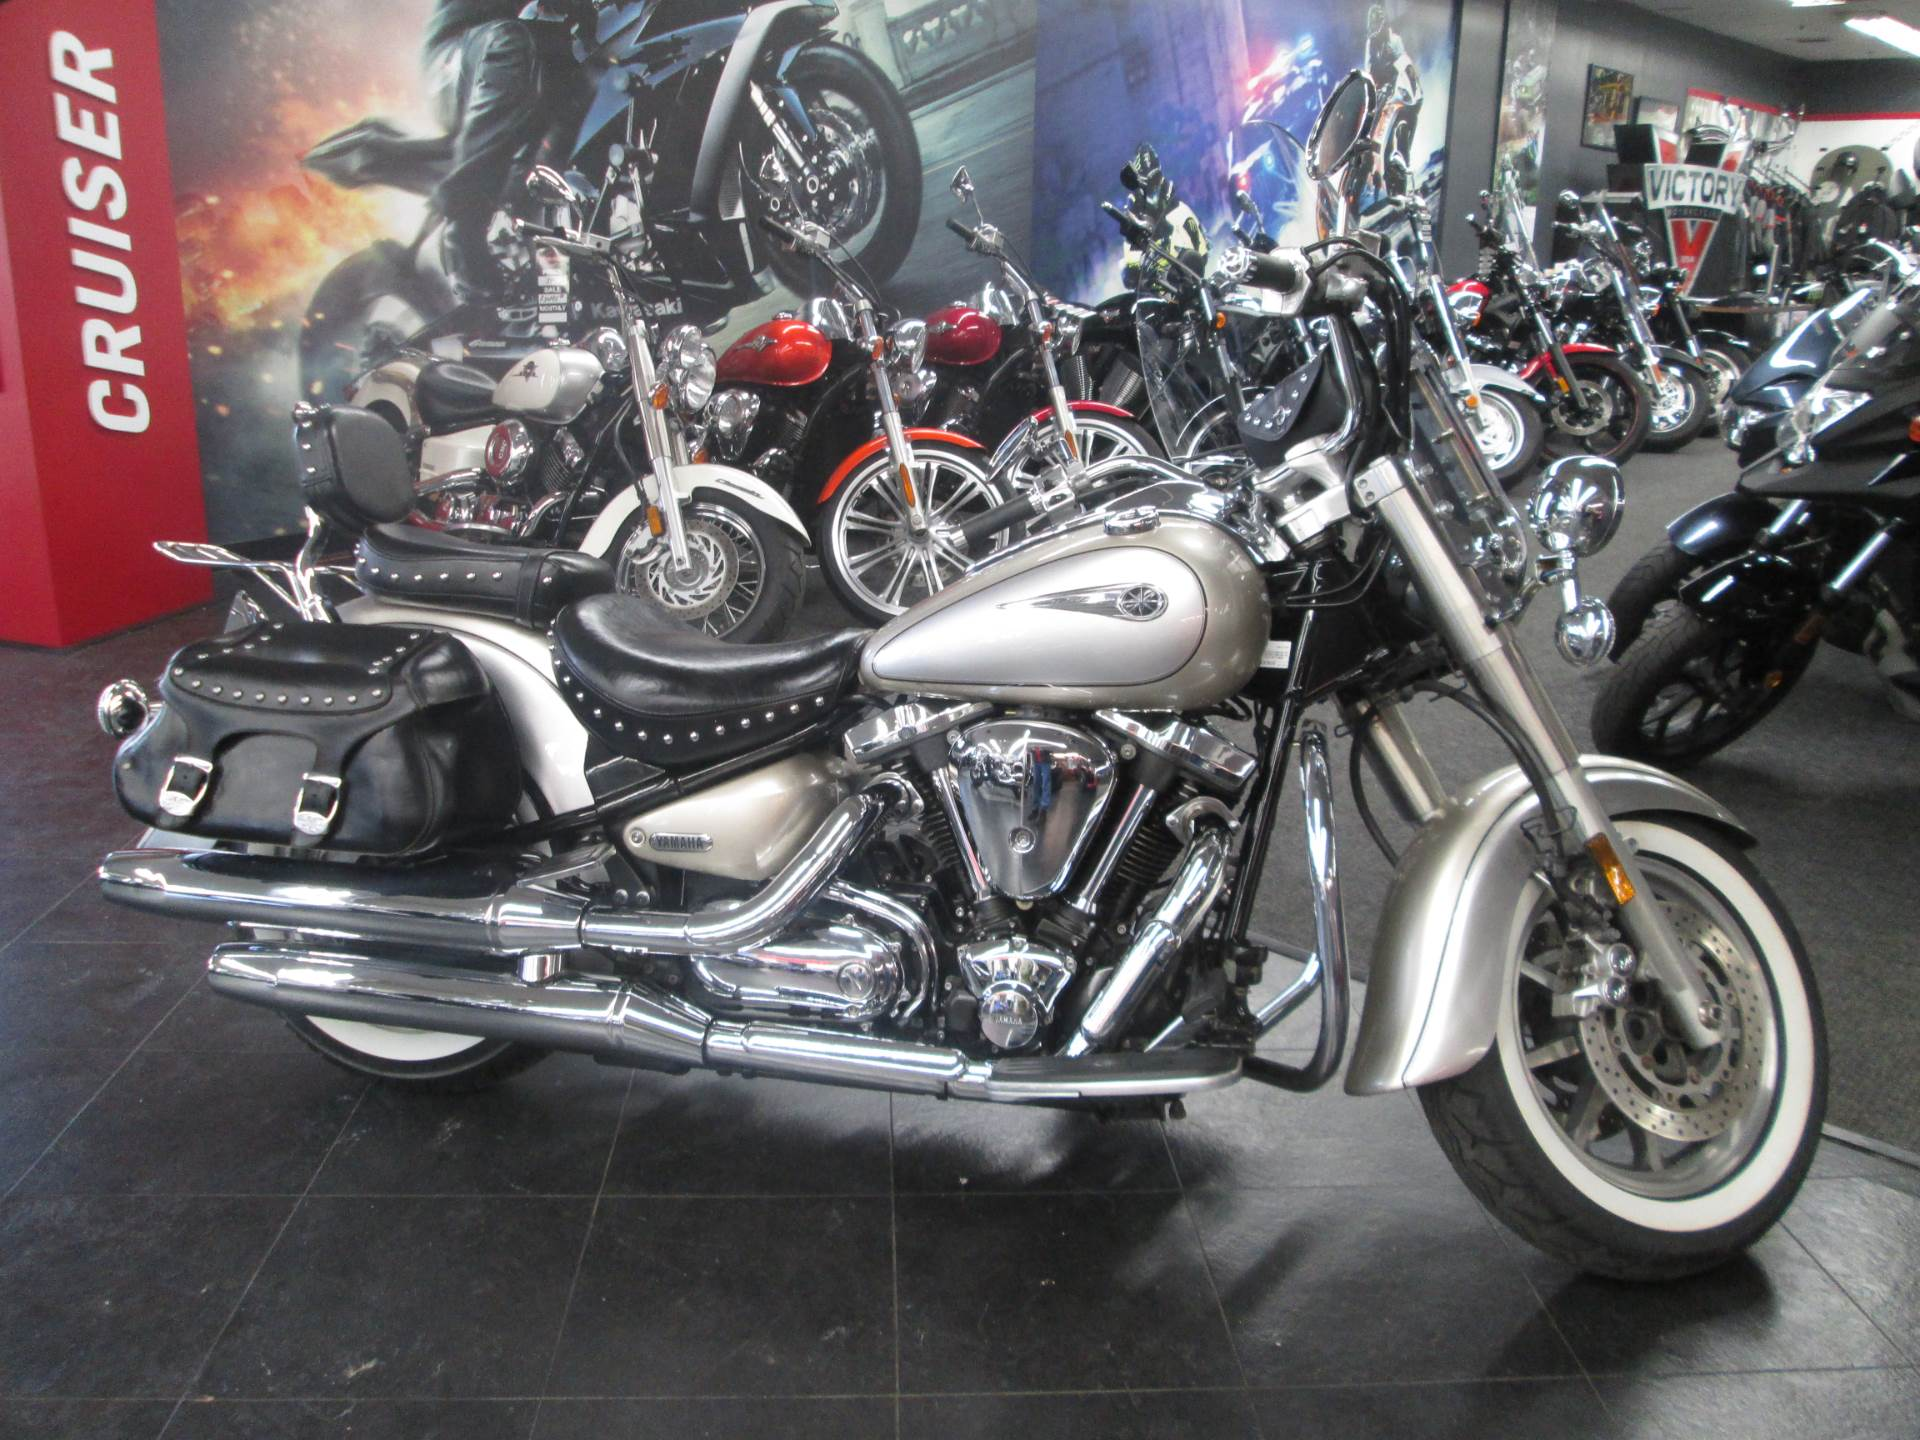 2005 Yamaha Road Star Silverado® in Philadelphia, Pennsylvania